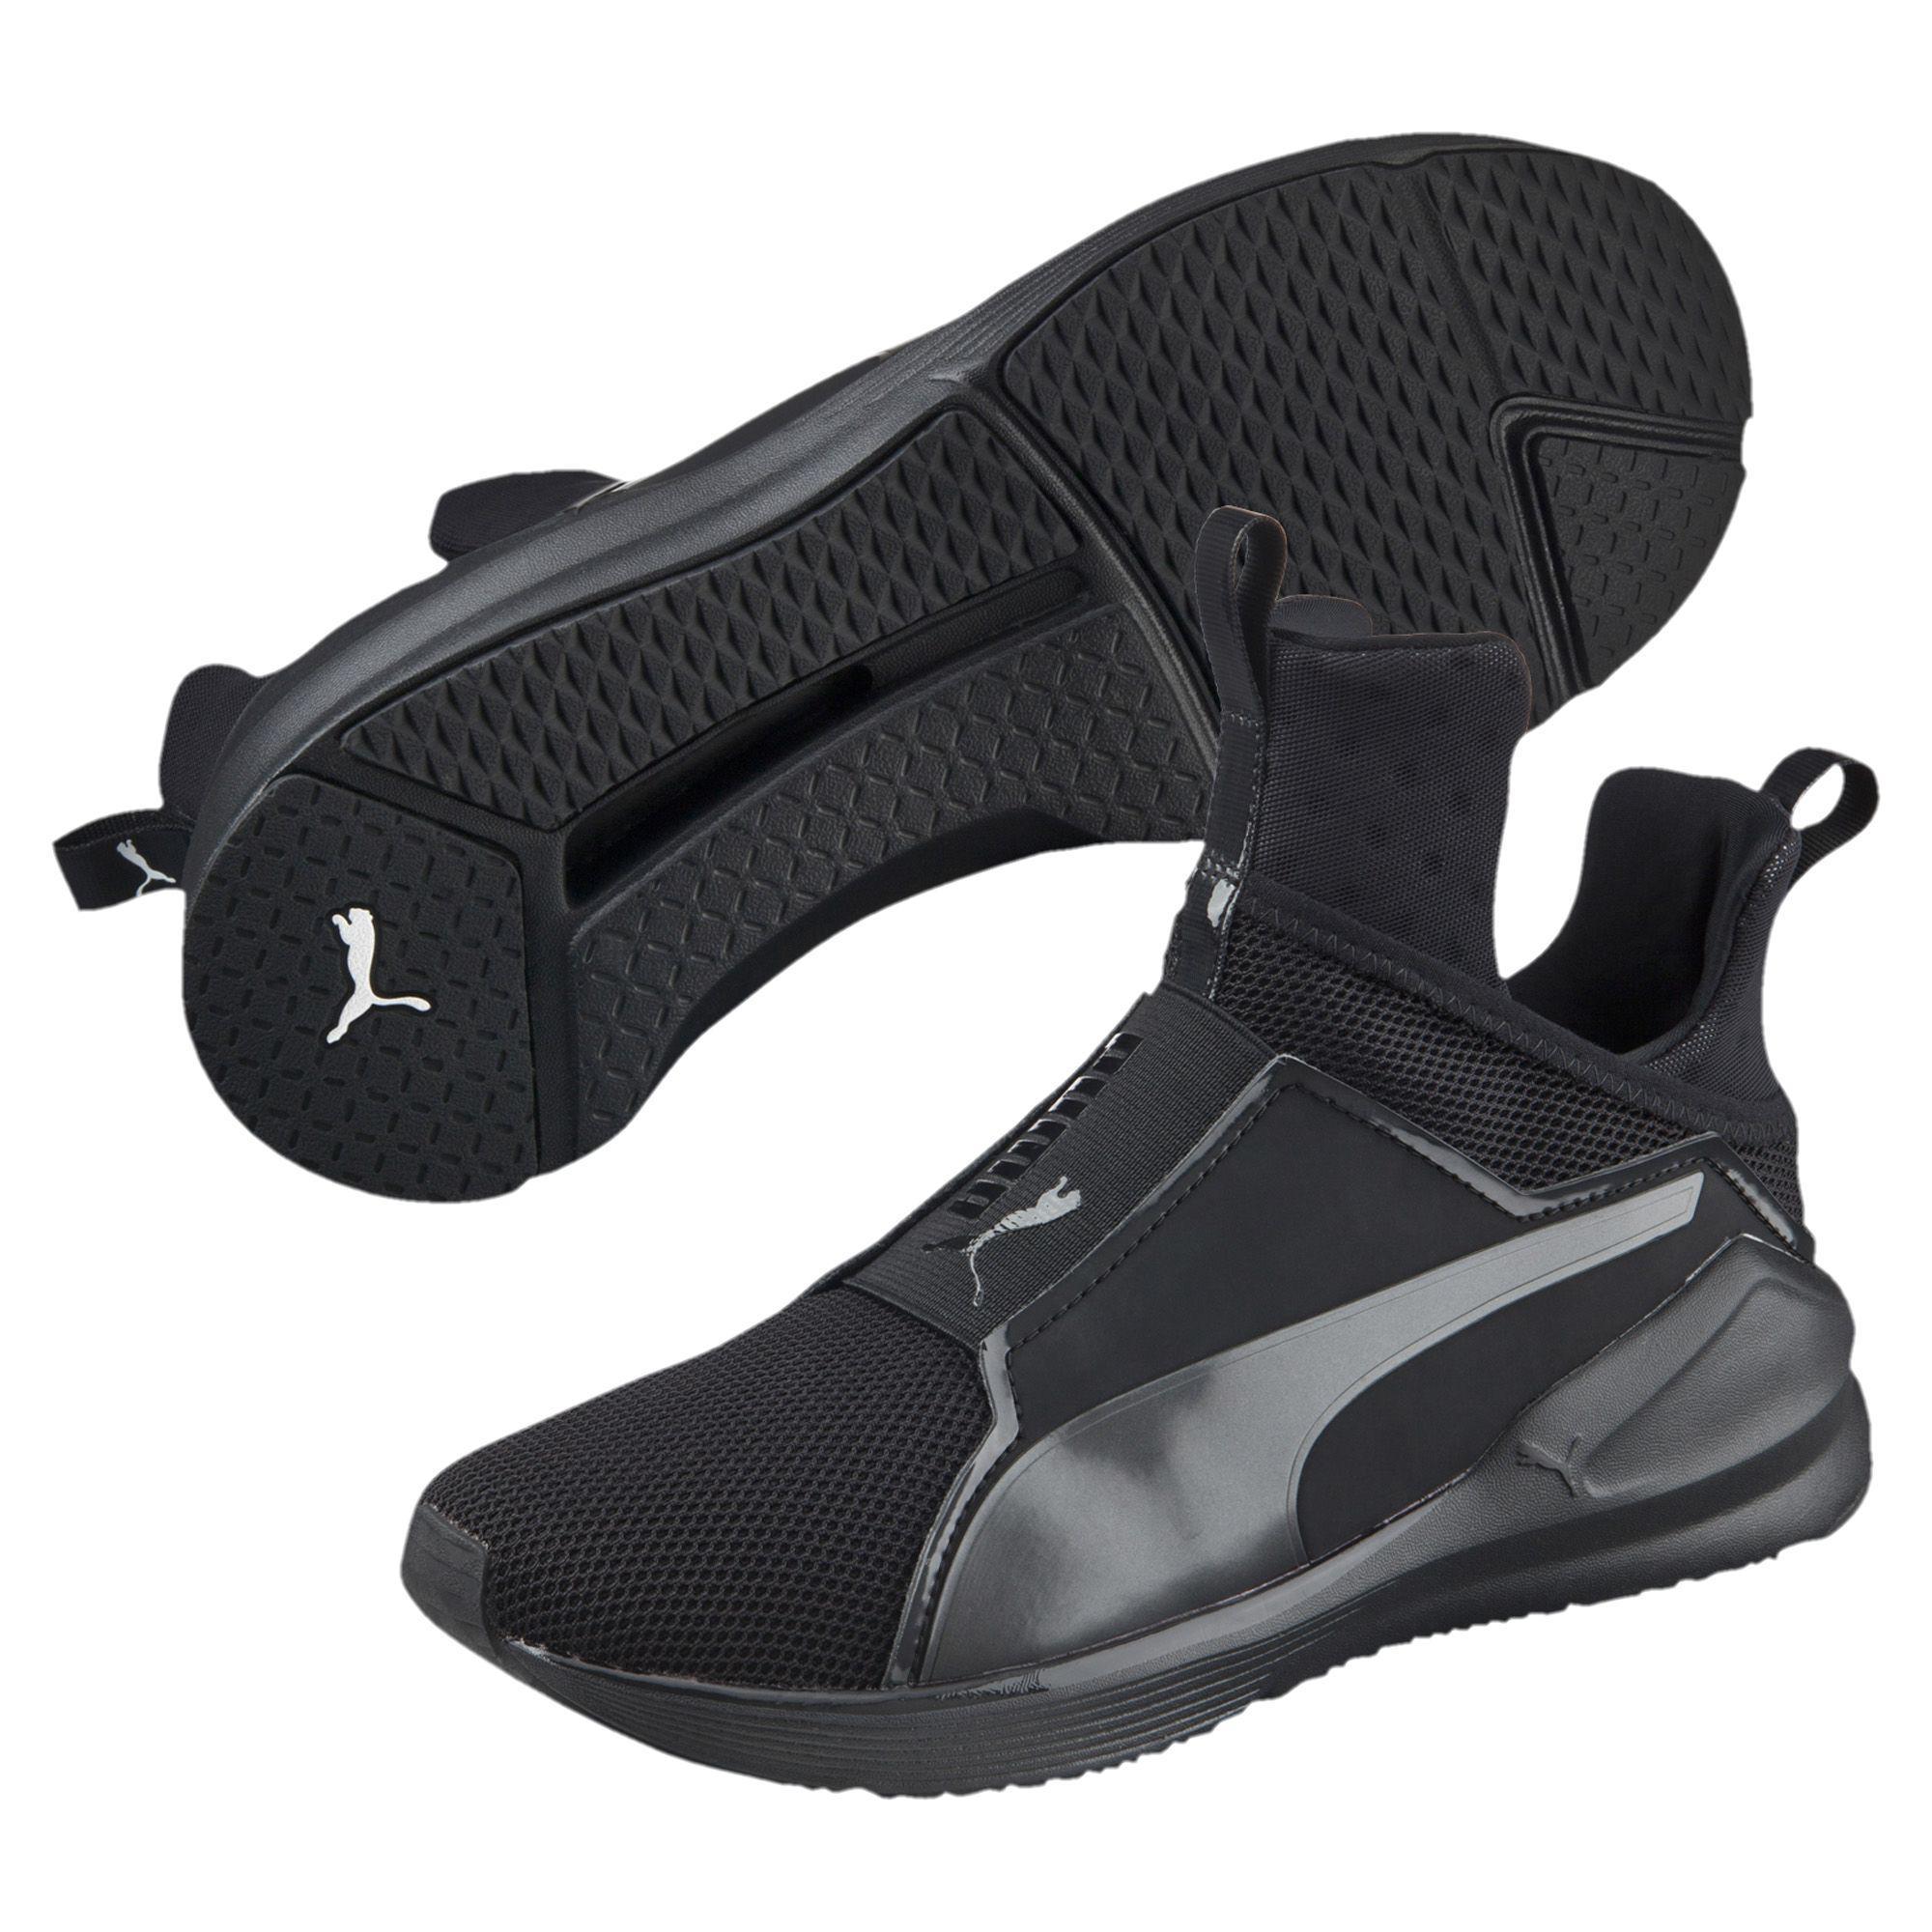 PUMA Rubber Fierce Core Training Shoes